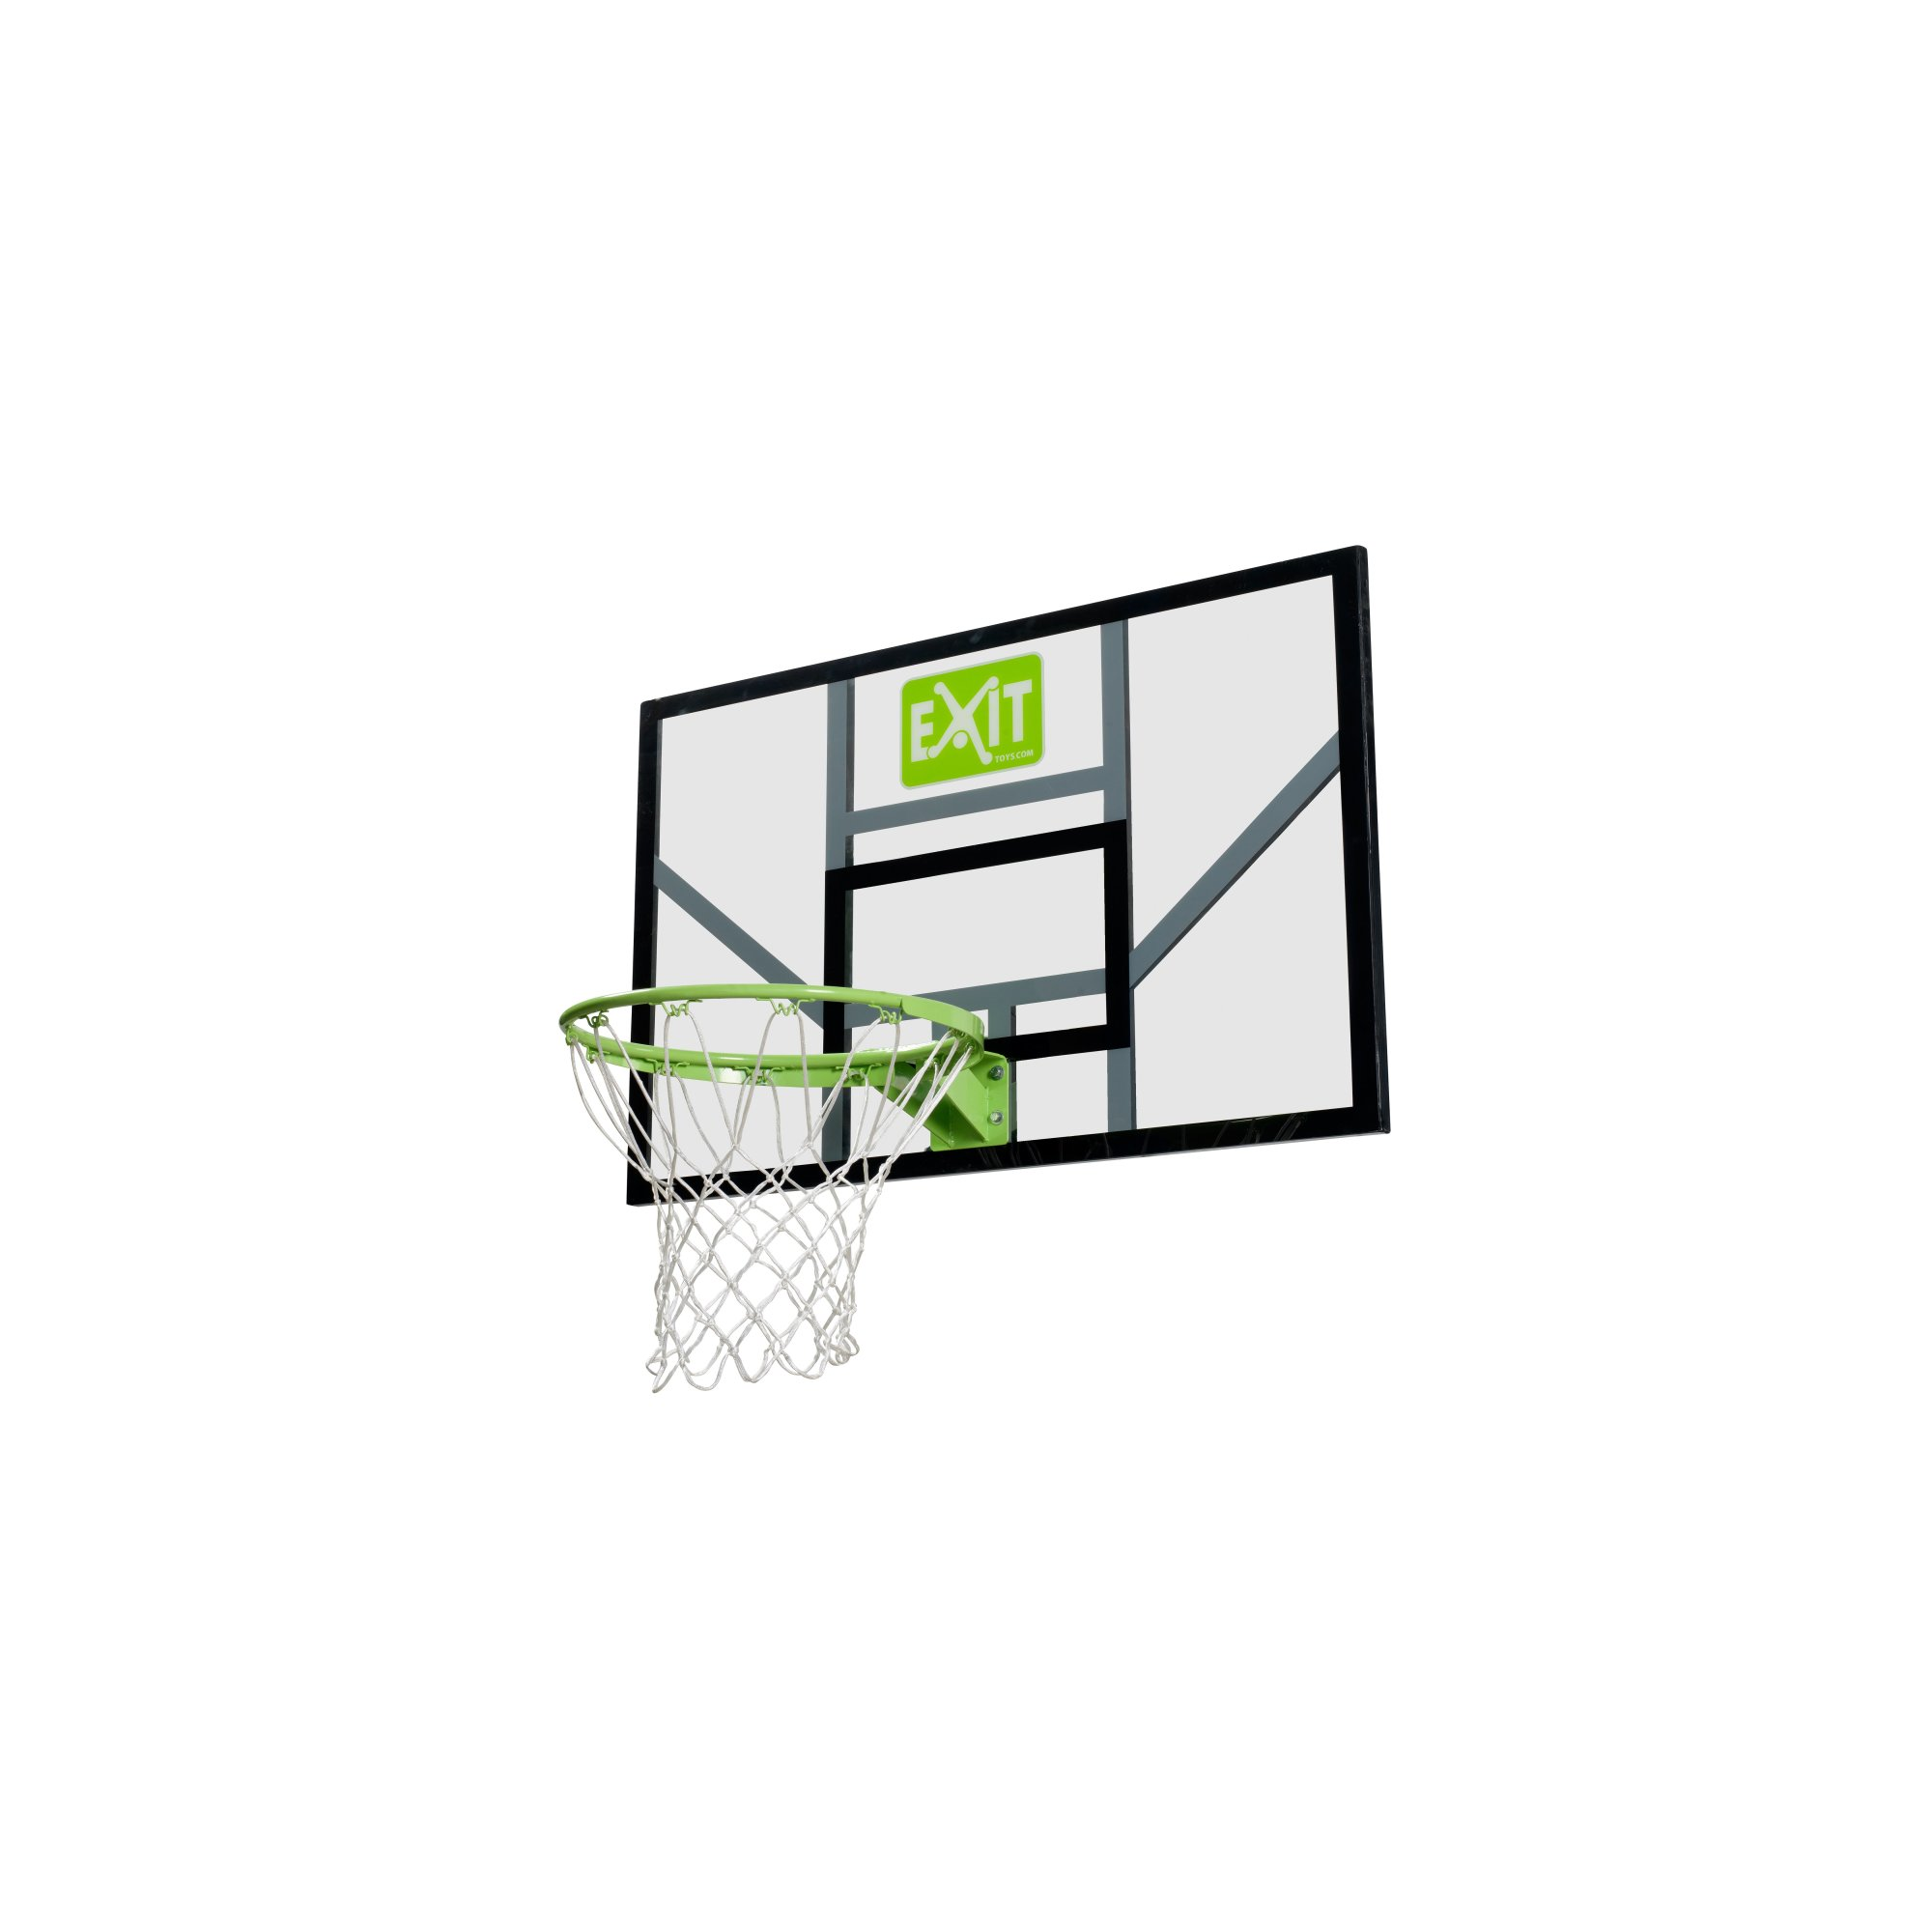 https://www.kwd.nl/media/catalog/product/4/6/46-40-20-00-exit-galaxy-basketbalbord-met-ring-en-net-groen-zwart-1.jpg